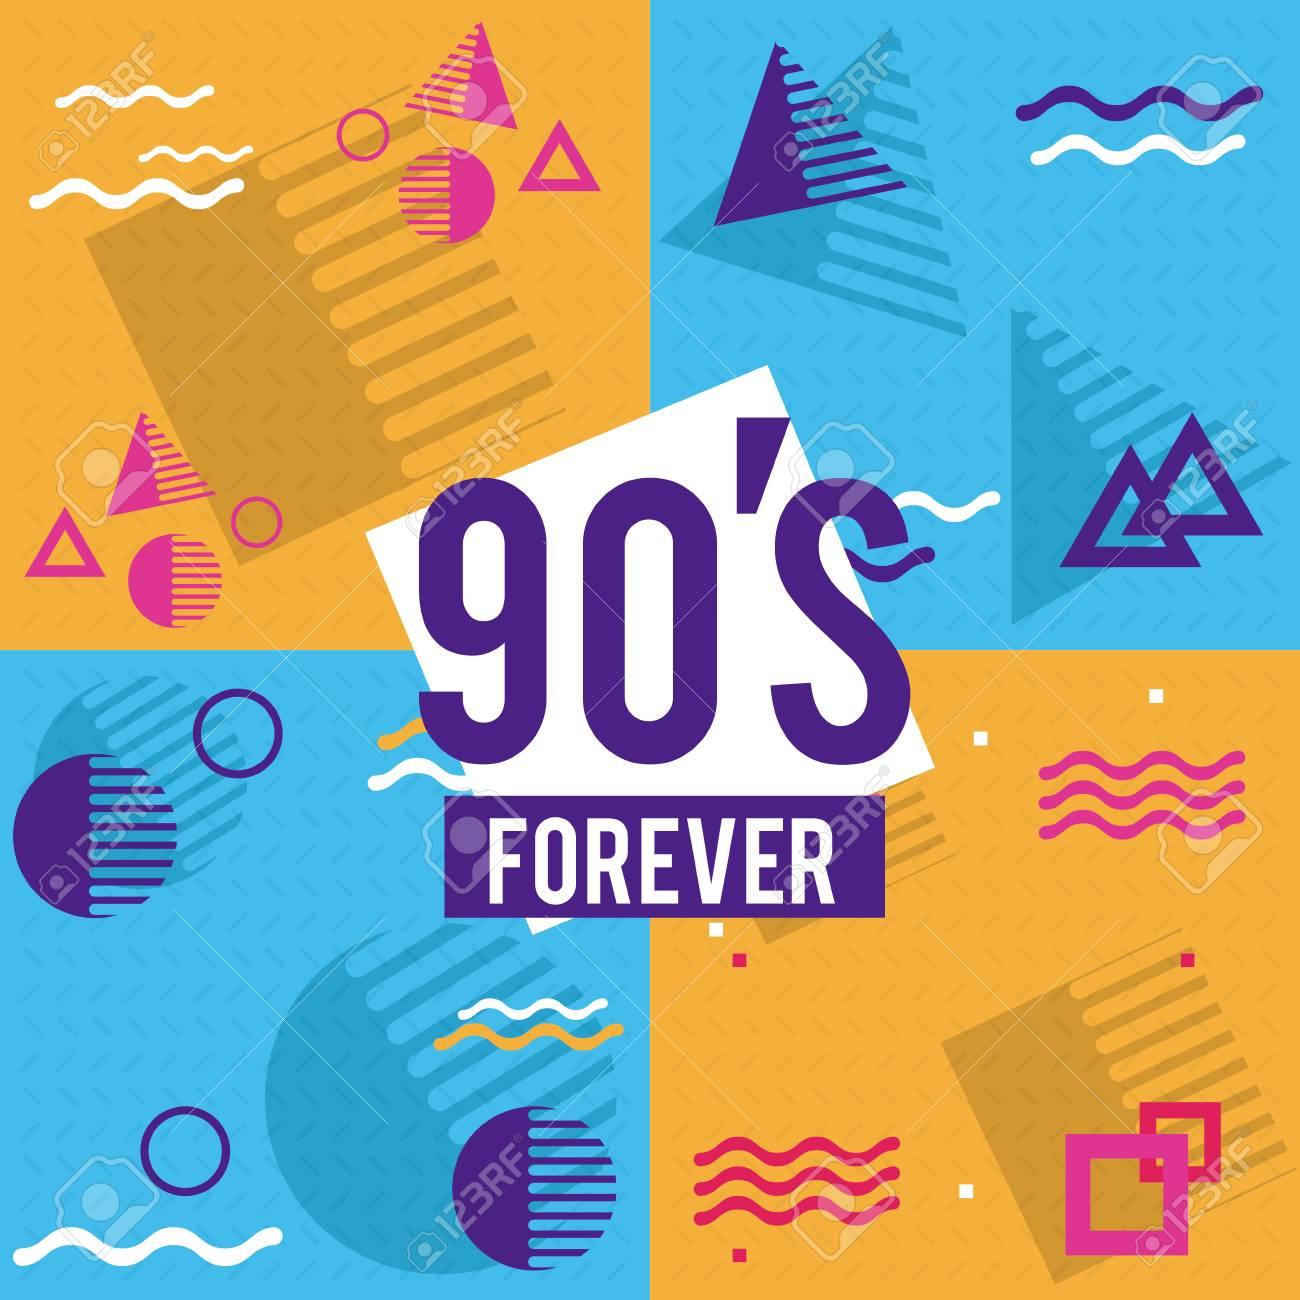 90s forever design icon vector illustration graphic design